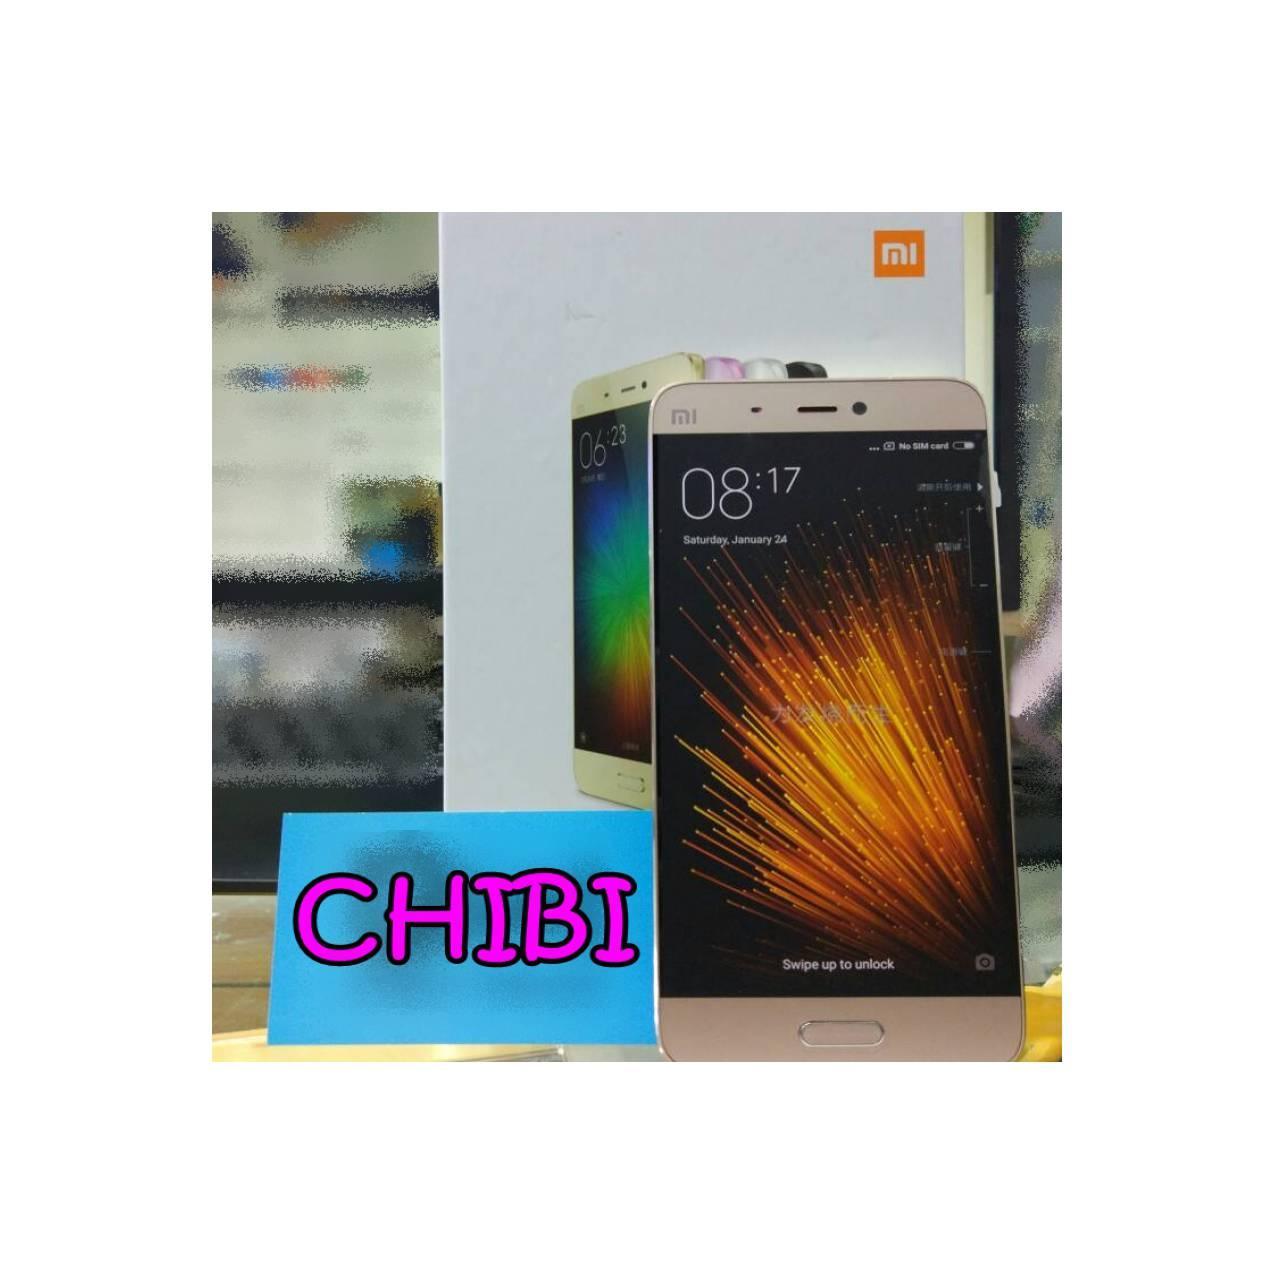 hp handphone xiaomi mi5 memory internal 3GB/32GB GOLD  - b997d8da92a07ad78c3df5b4d7d94cf7 - Update Harga Terbaru Hp Xiaomi Mi5 Gsmarena Agustus 2018